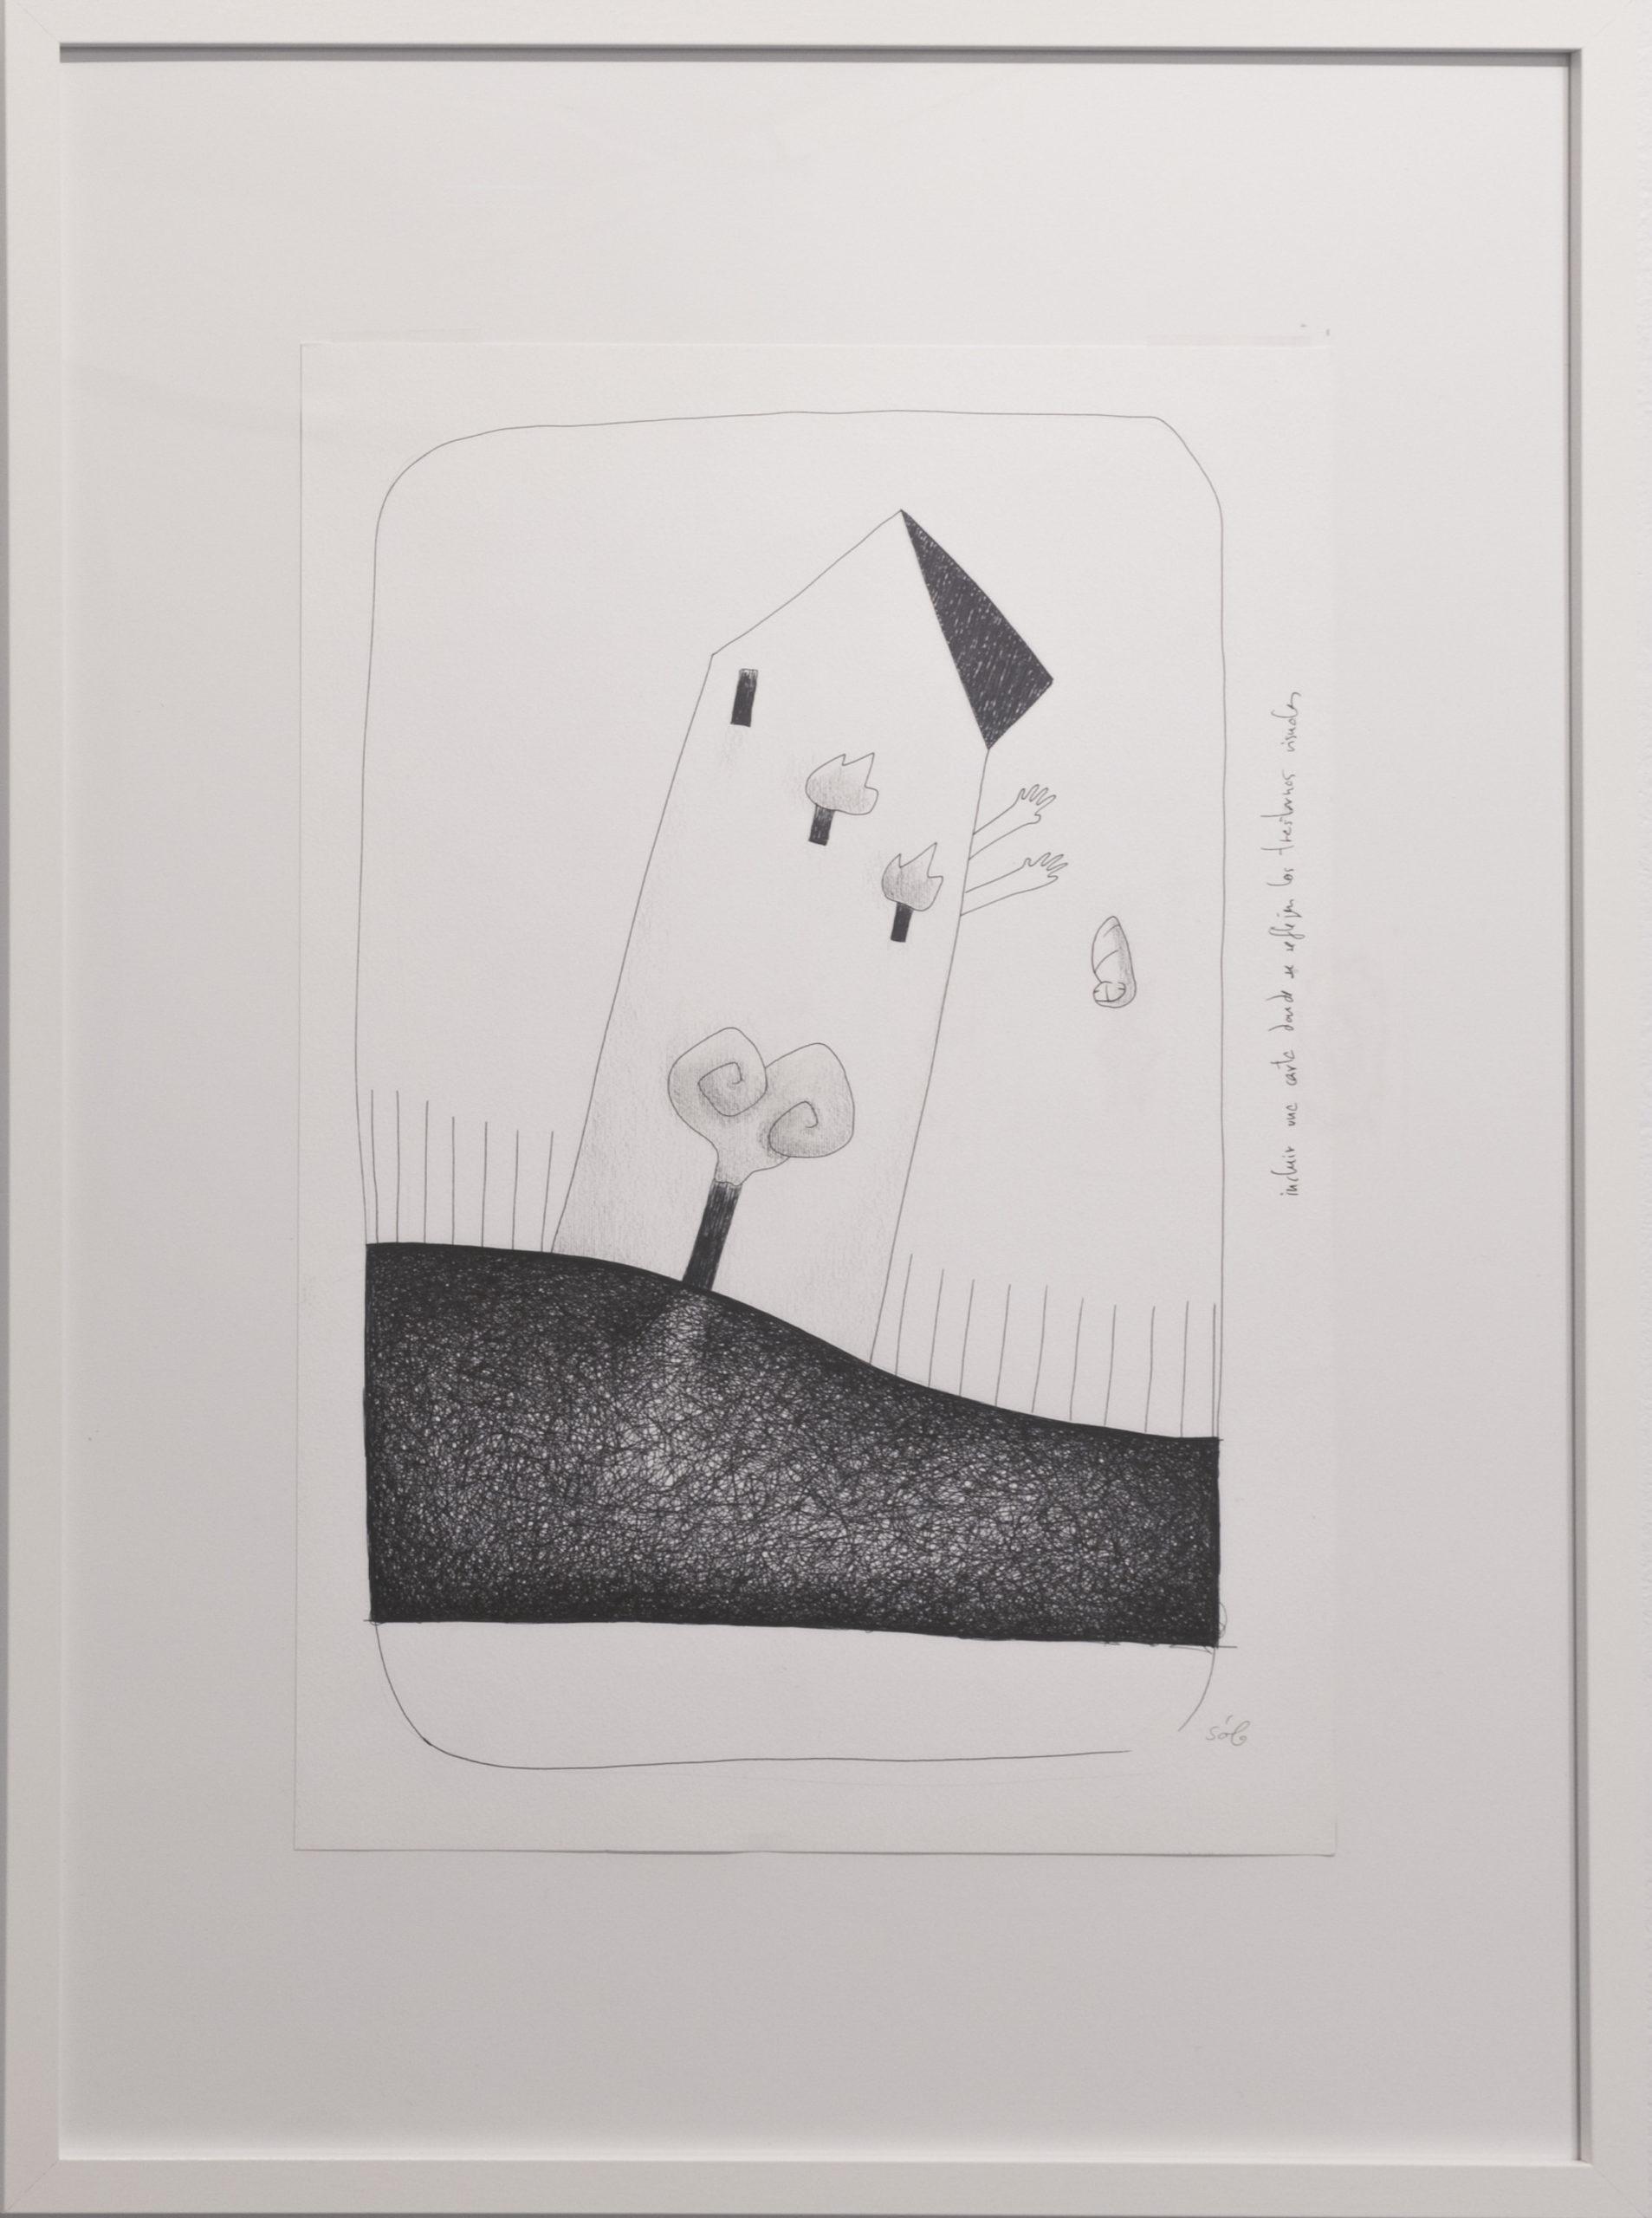 La Casa en Llamas | original sketch (Tarot de Laguna)